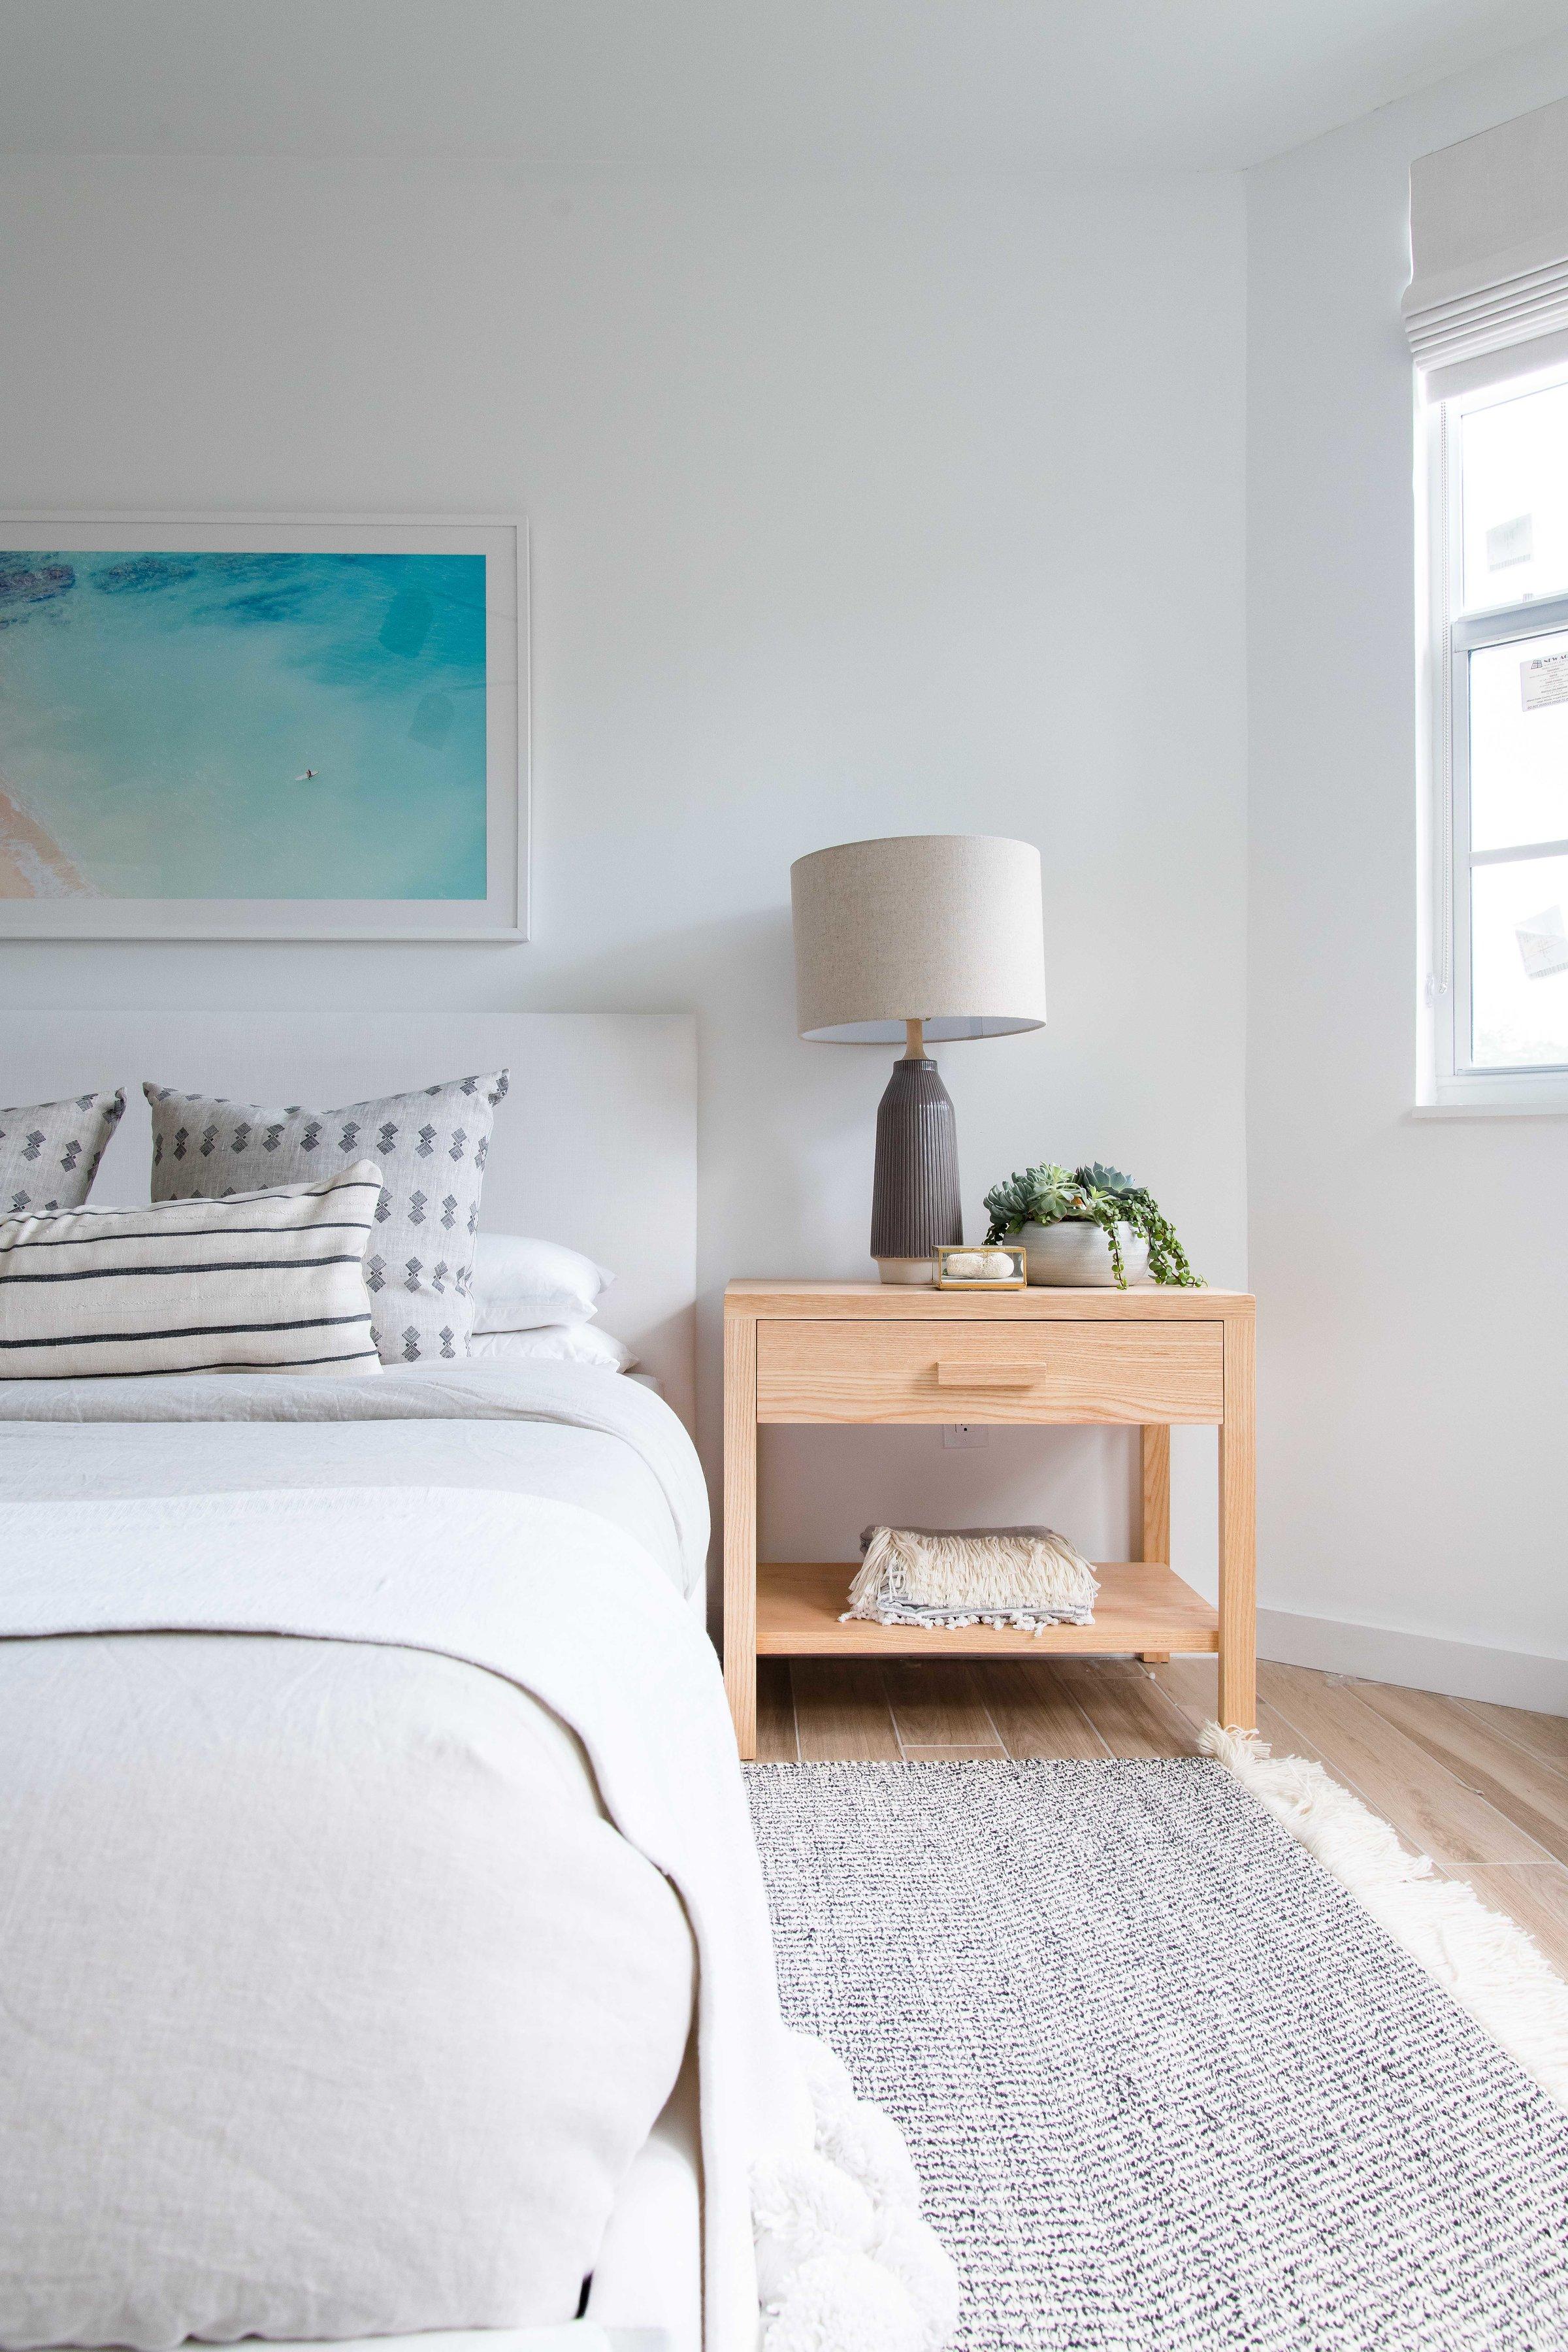 modern wooden nightstand in bright master bedroom - the habitat collective interior design - #projectpeachy